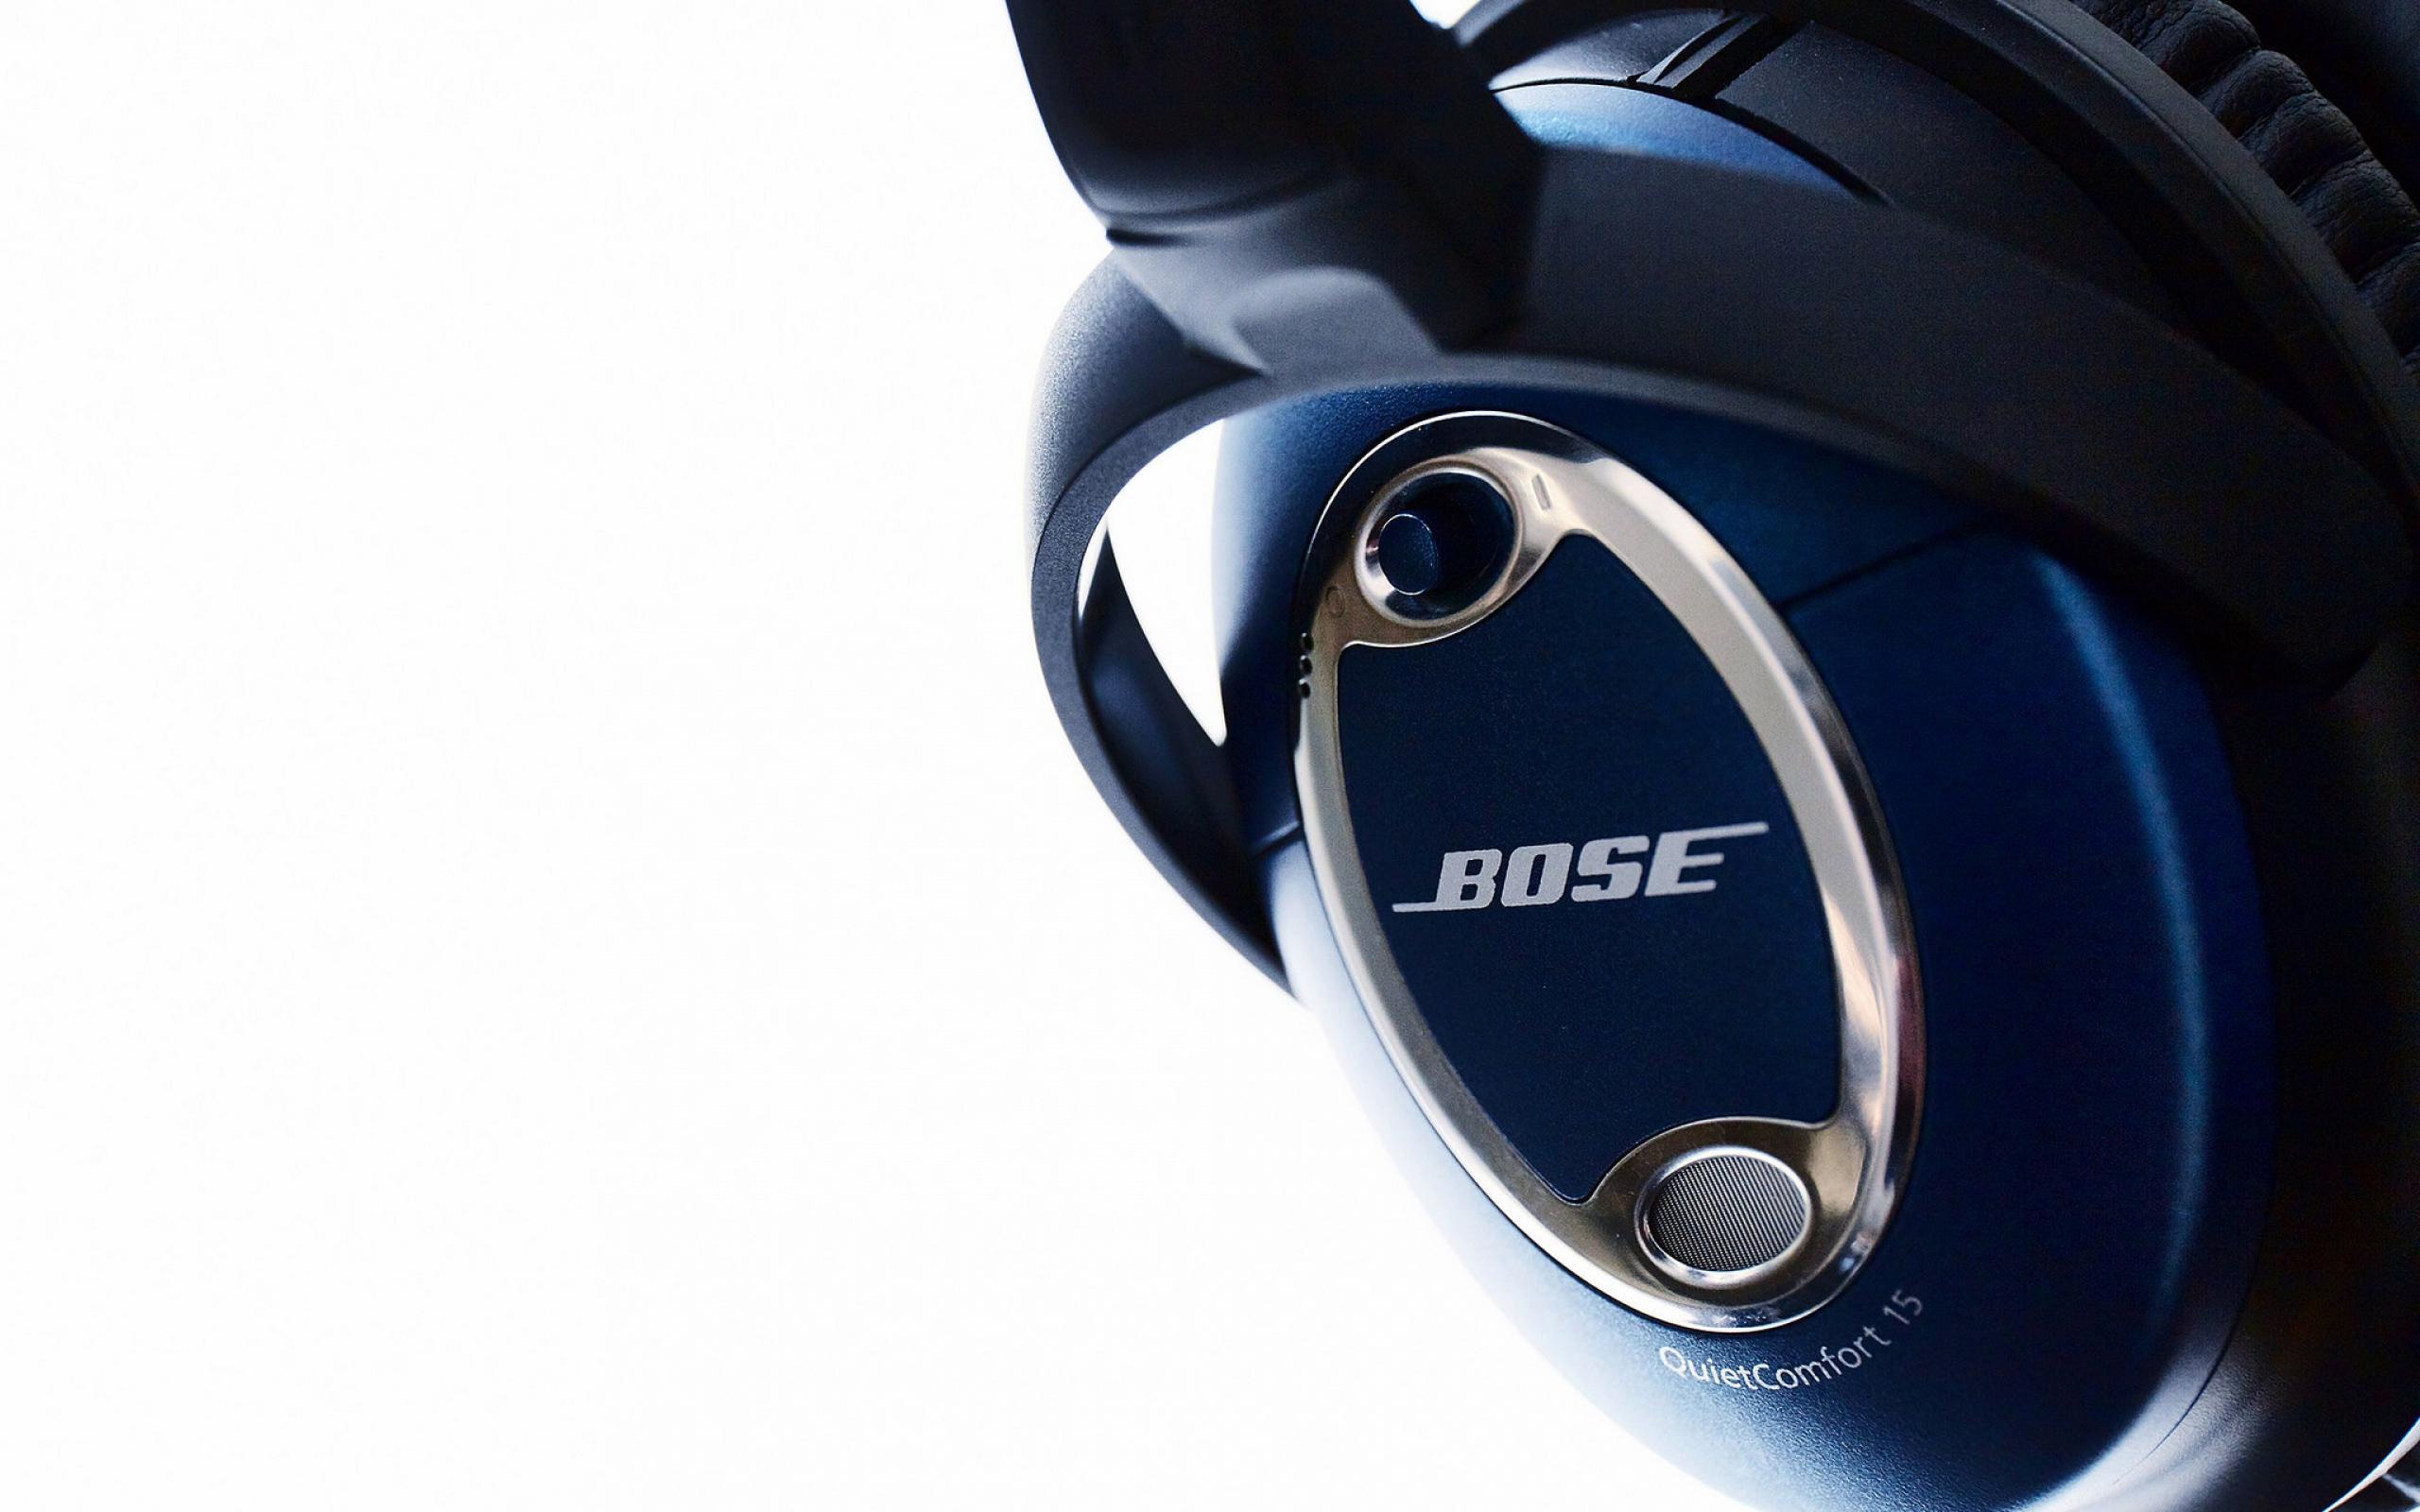 640x1136 Bose Headphones Logo IPhone 5,5c,5S,SE ,Ipod